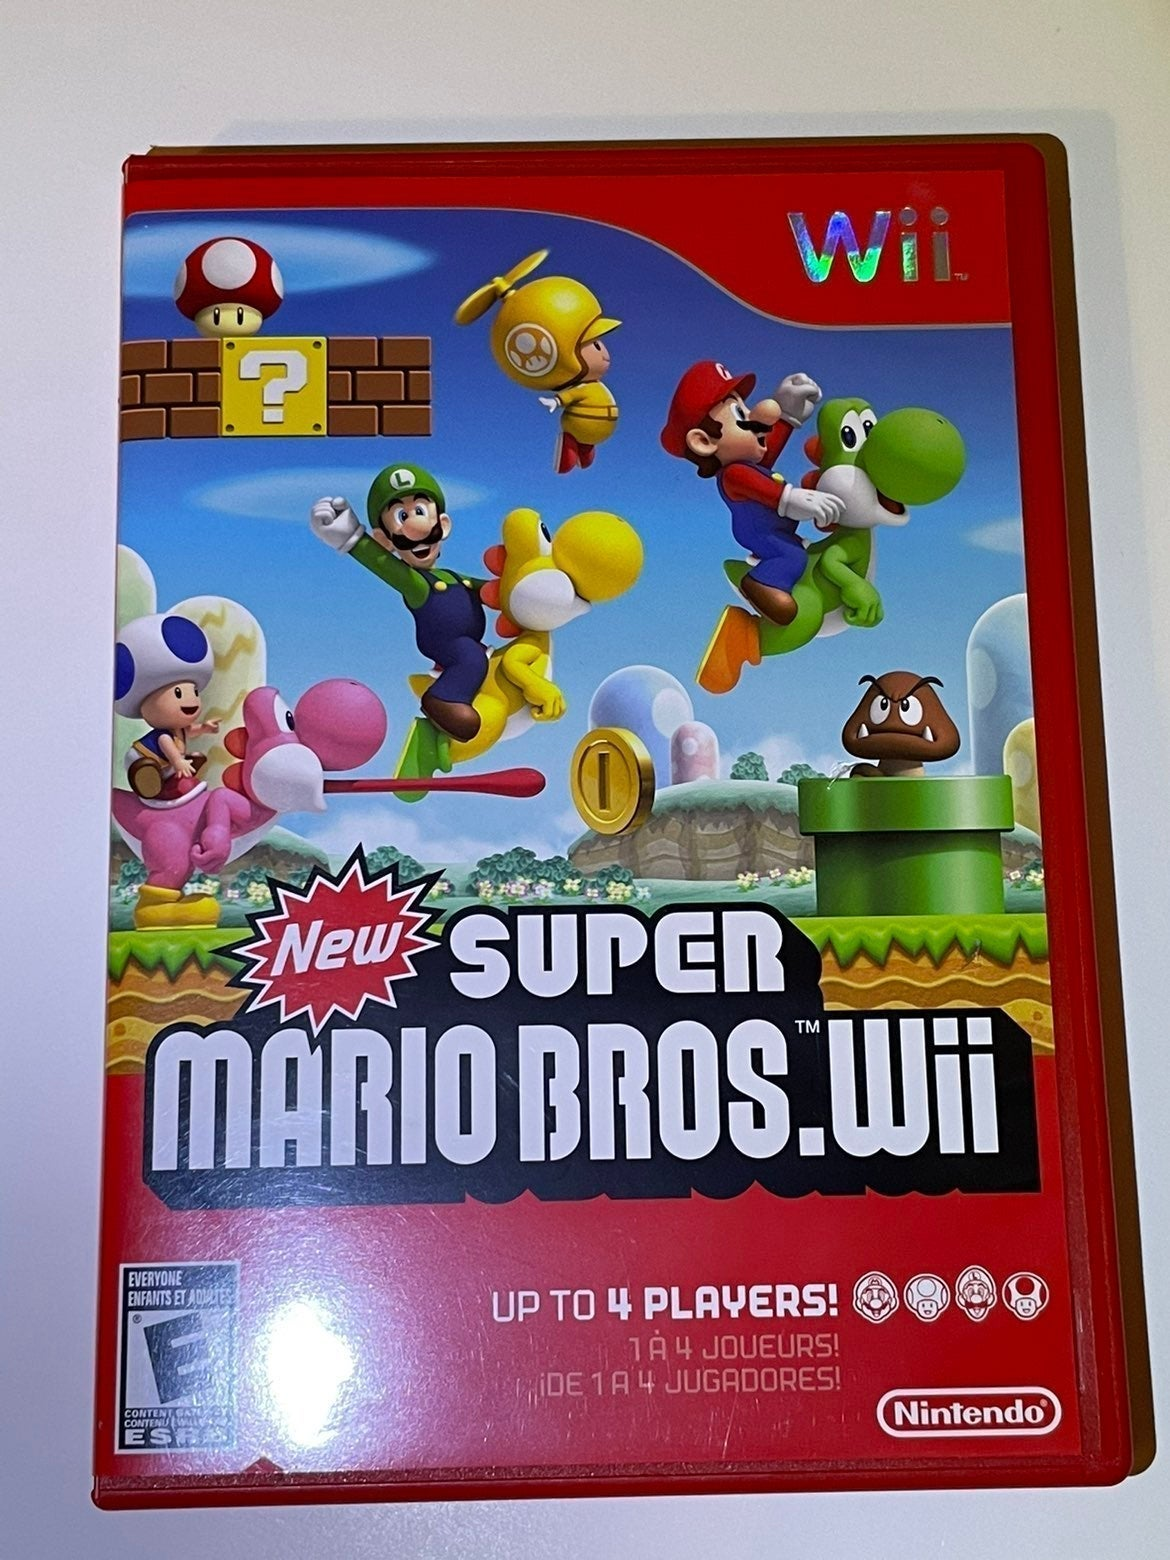 New Super Mario Bros. Wii on Nintendo Wi